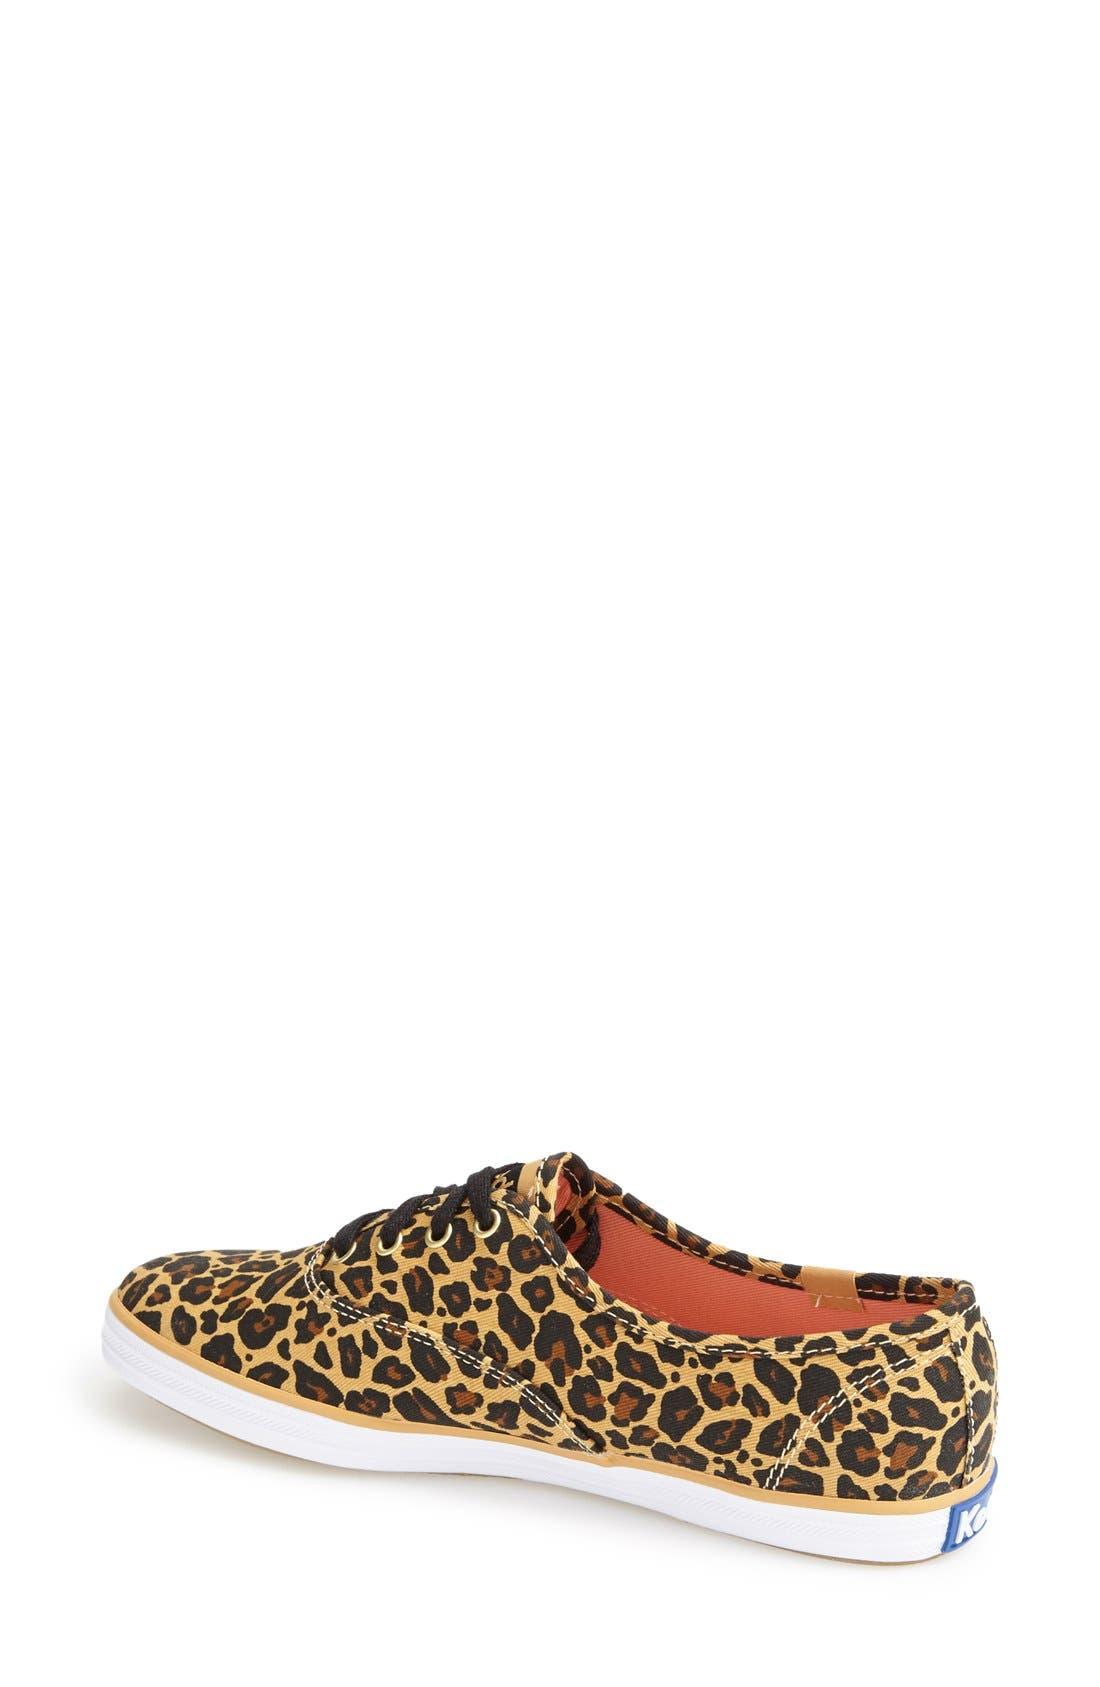 KEDS<SUP>®</SUP>,                             'Champion' Leopard Print Sneaker,                             Alternate thumbnail 4, color,                             230